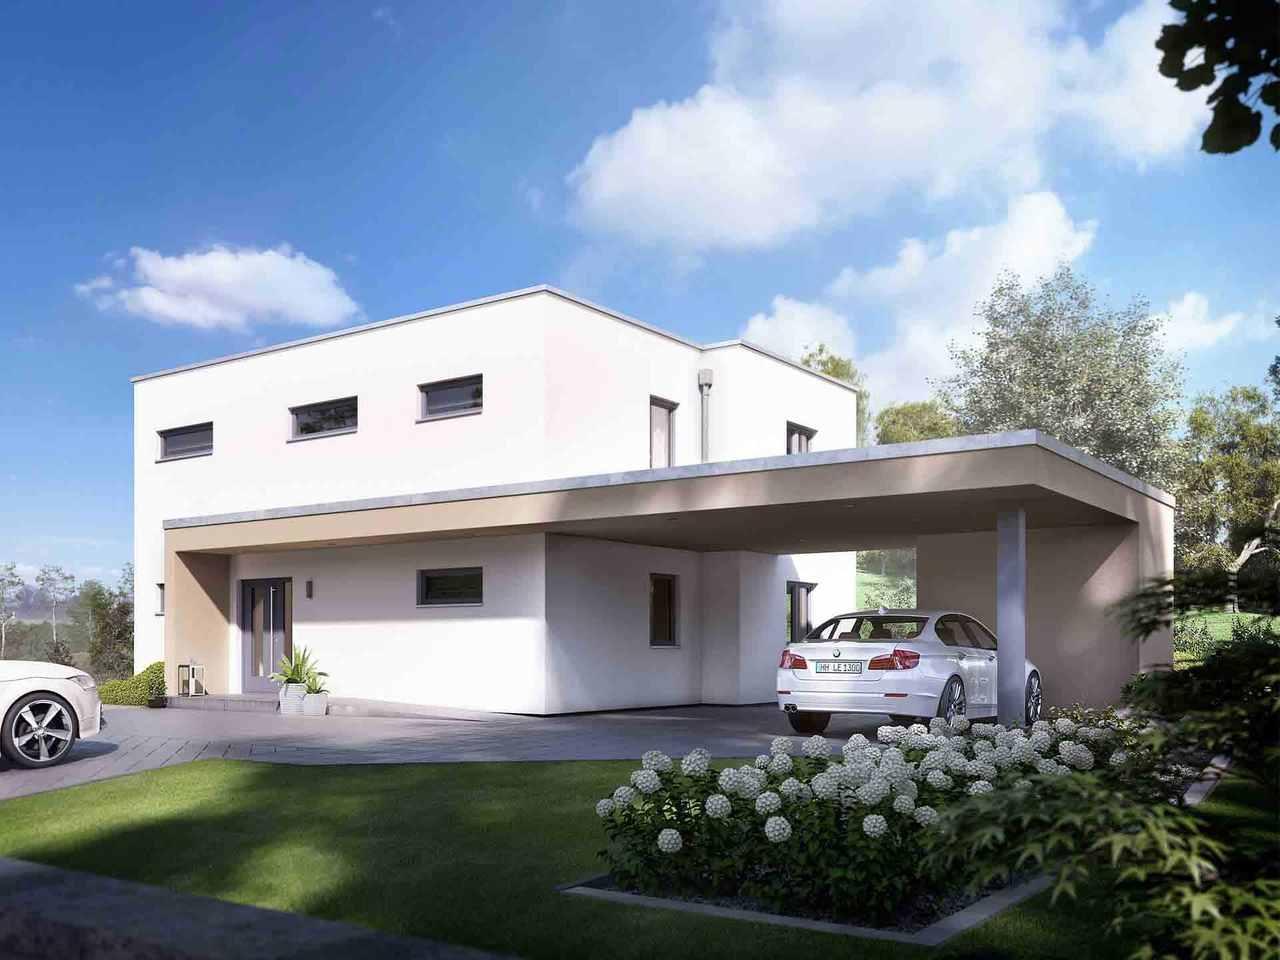 Einfamilienhaus Selection-E-175 E6 - Schwabenhaus